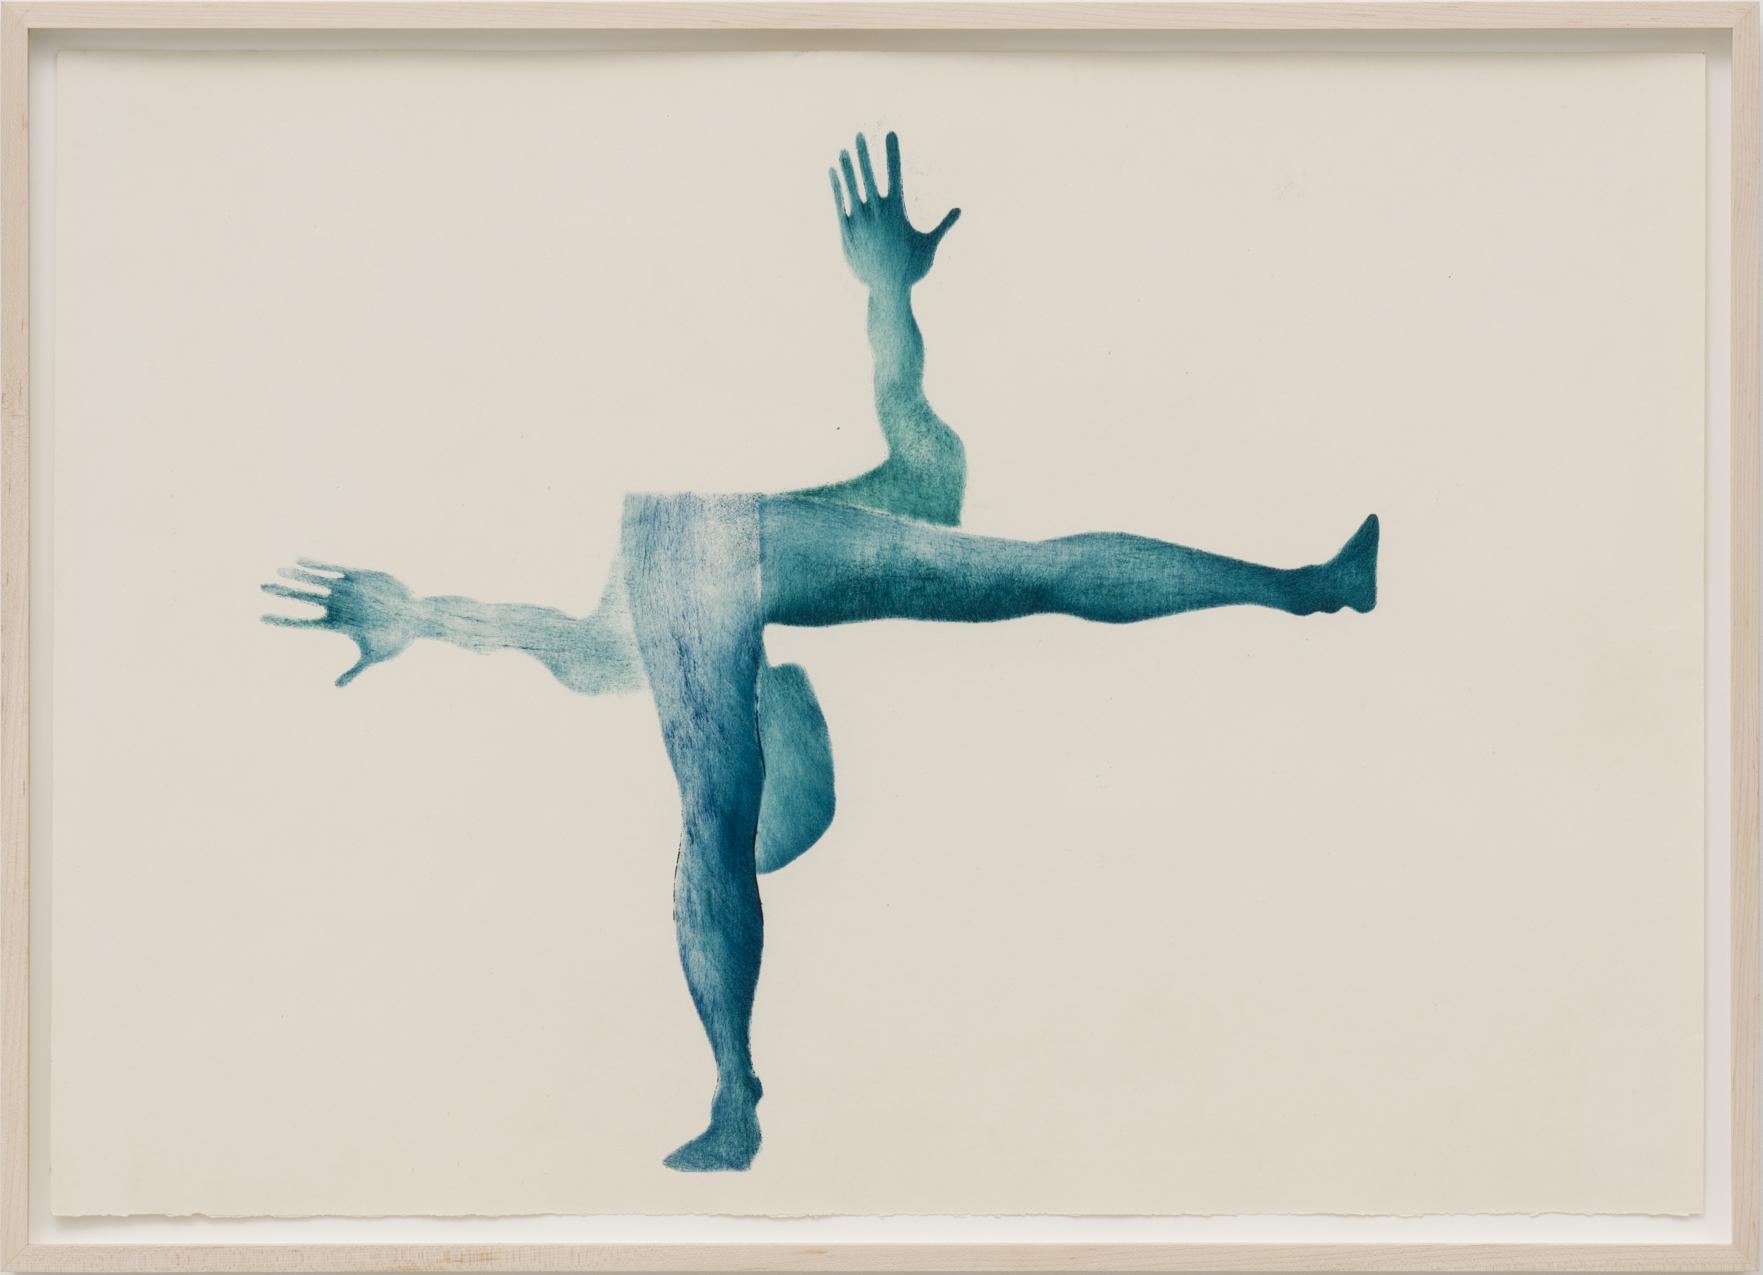 Ferenc Ficzek, Untitled, ca. 1977, series of 6 sprayed ink on paper, 57,5 x 36 cm each. Photo: Marcus Schneider_04